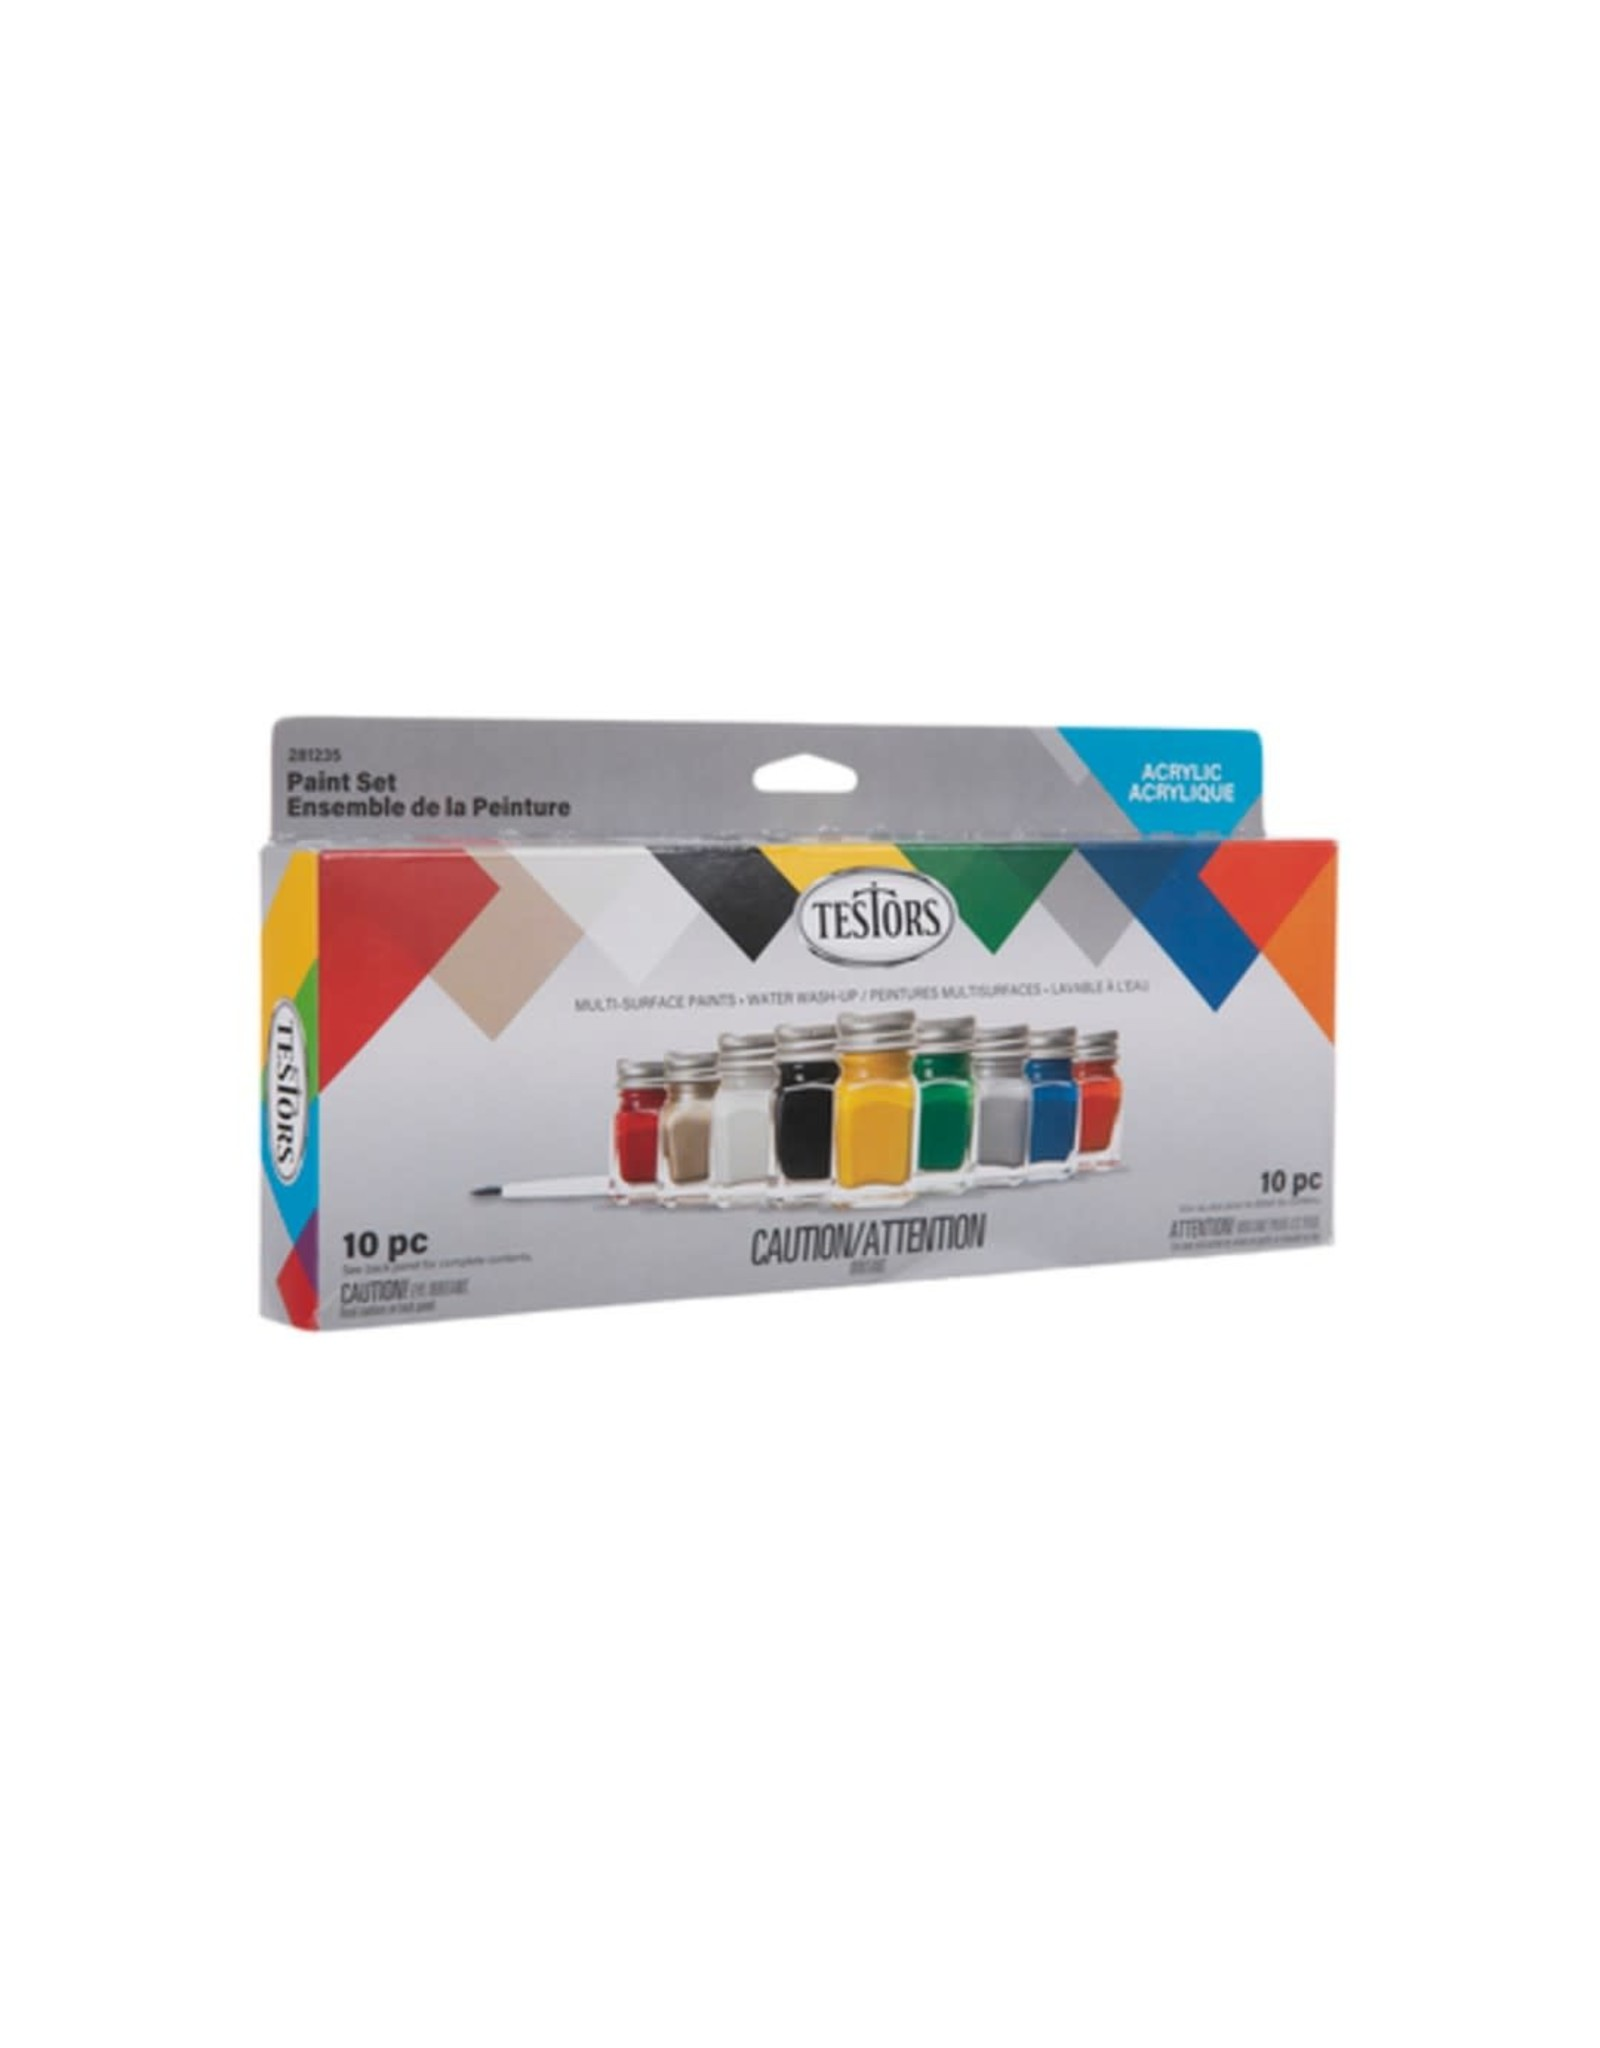 Acrylic Value Paint Set